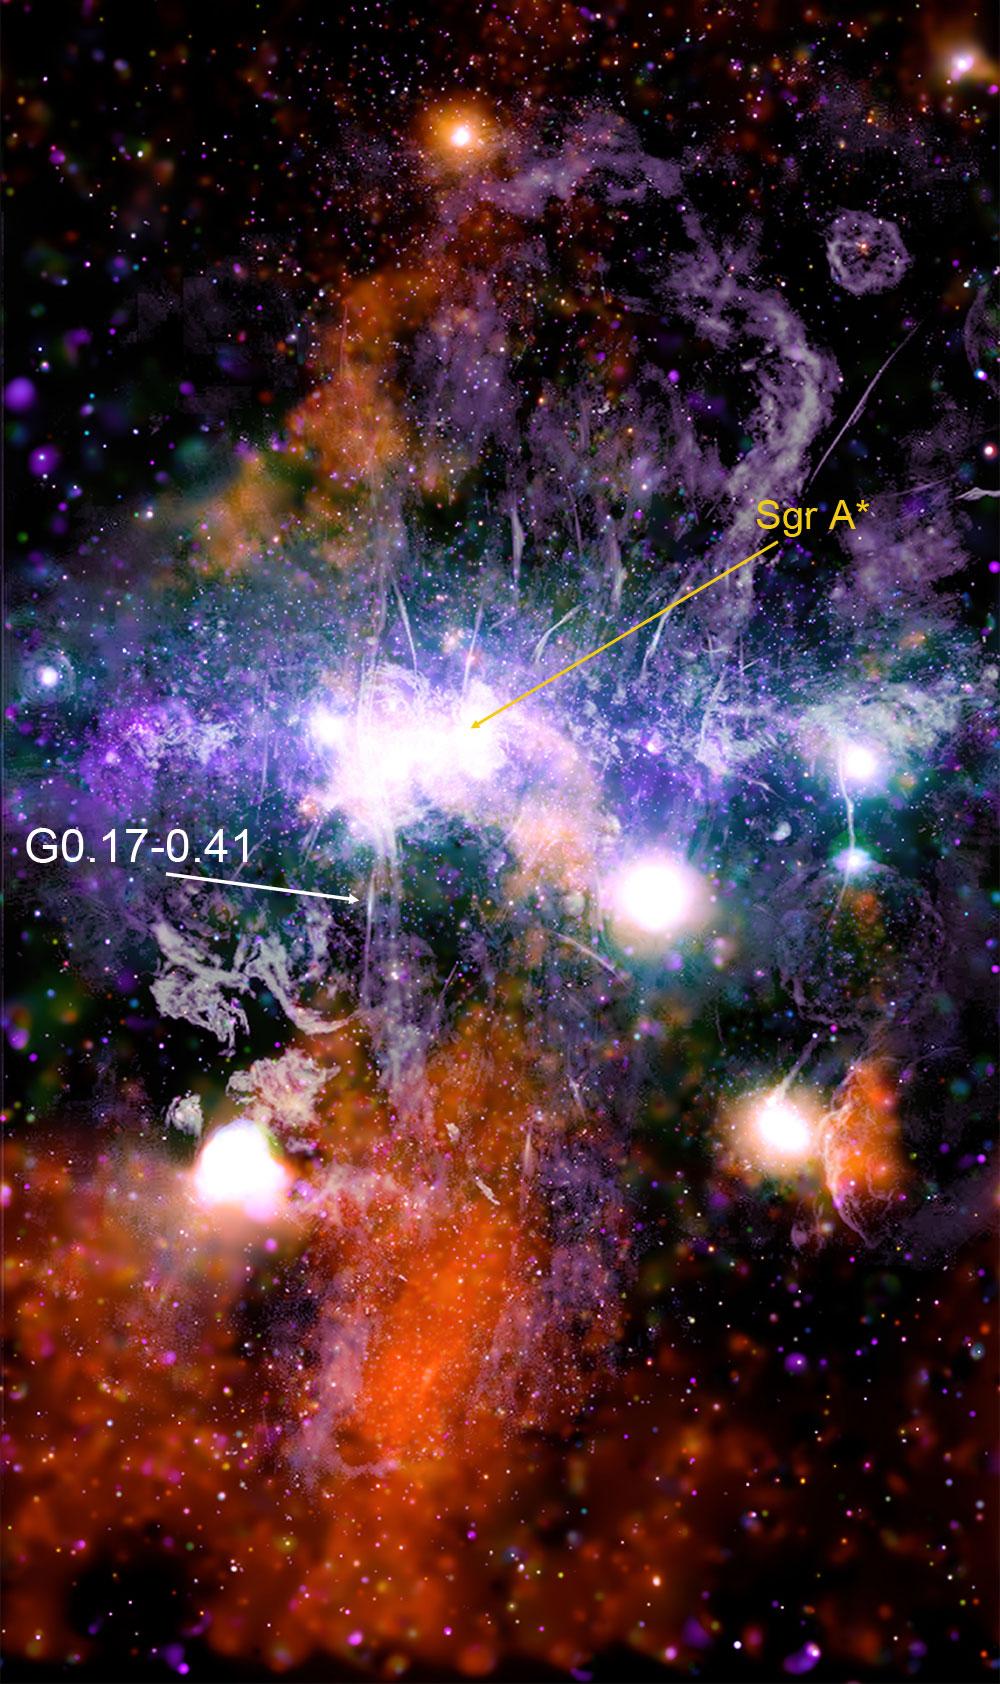 galactic-center-1.jpg